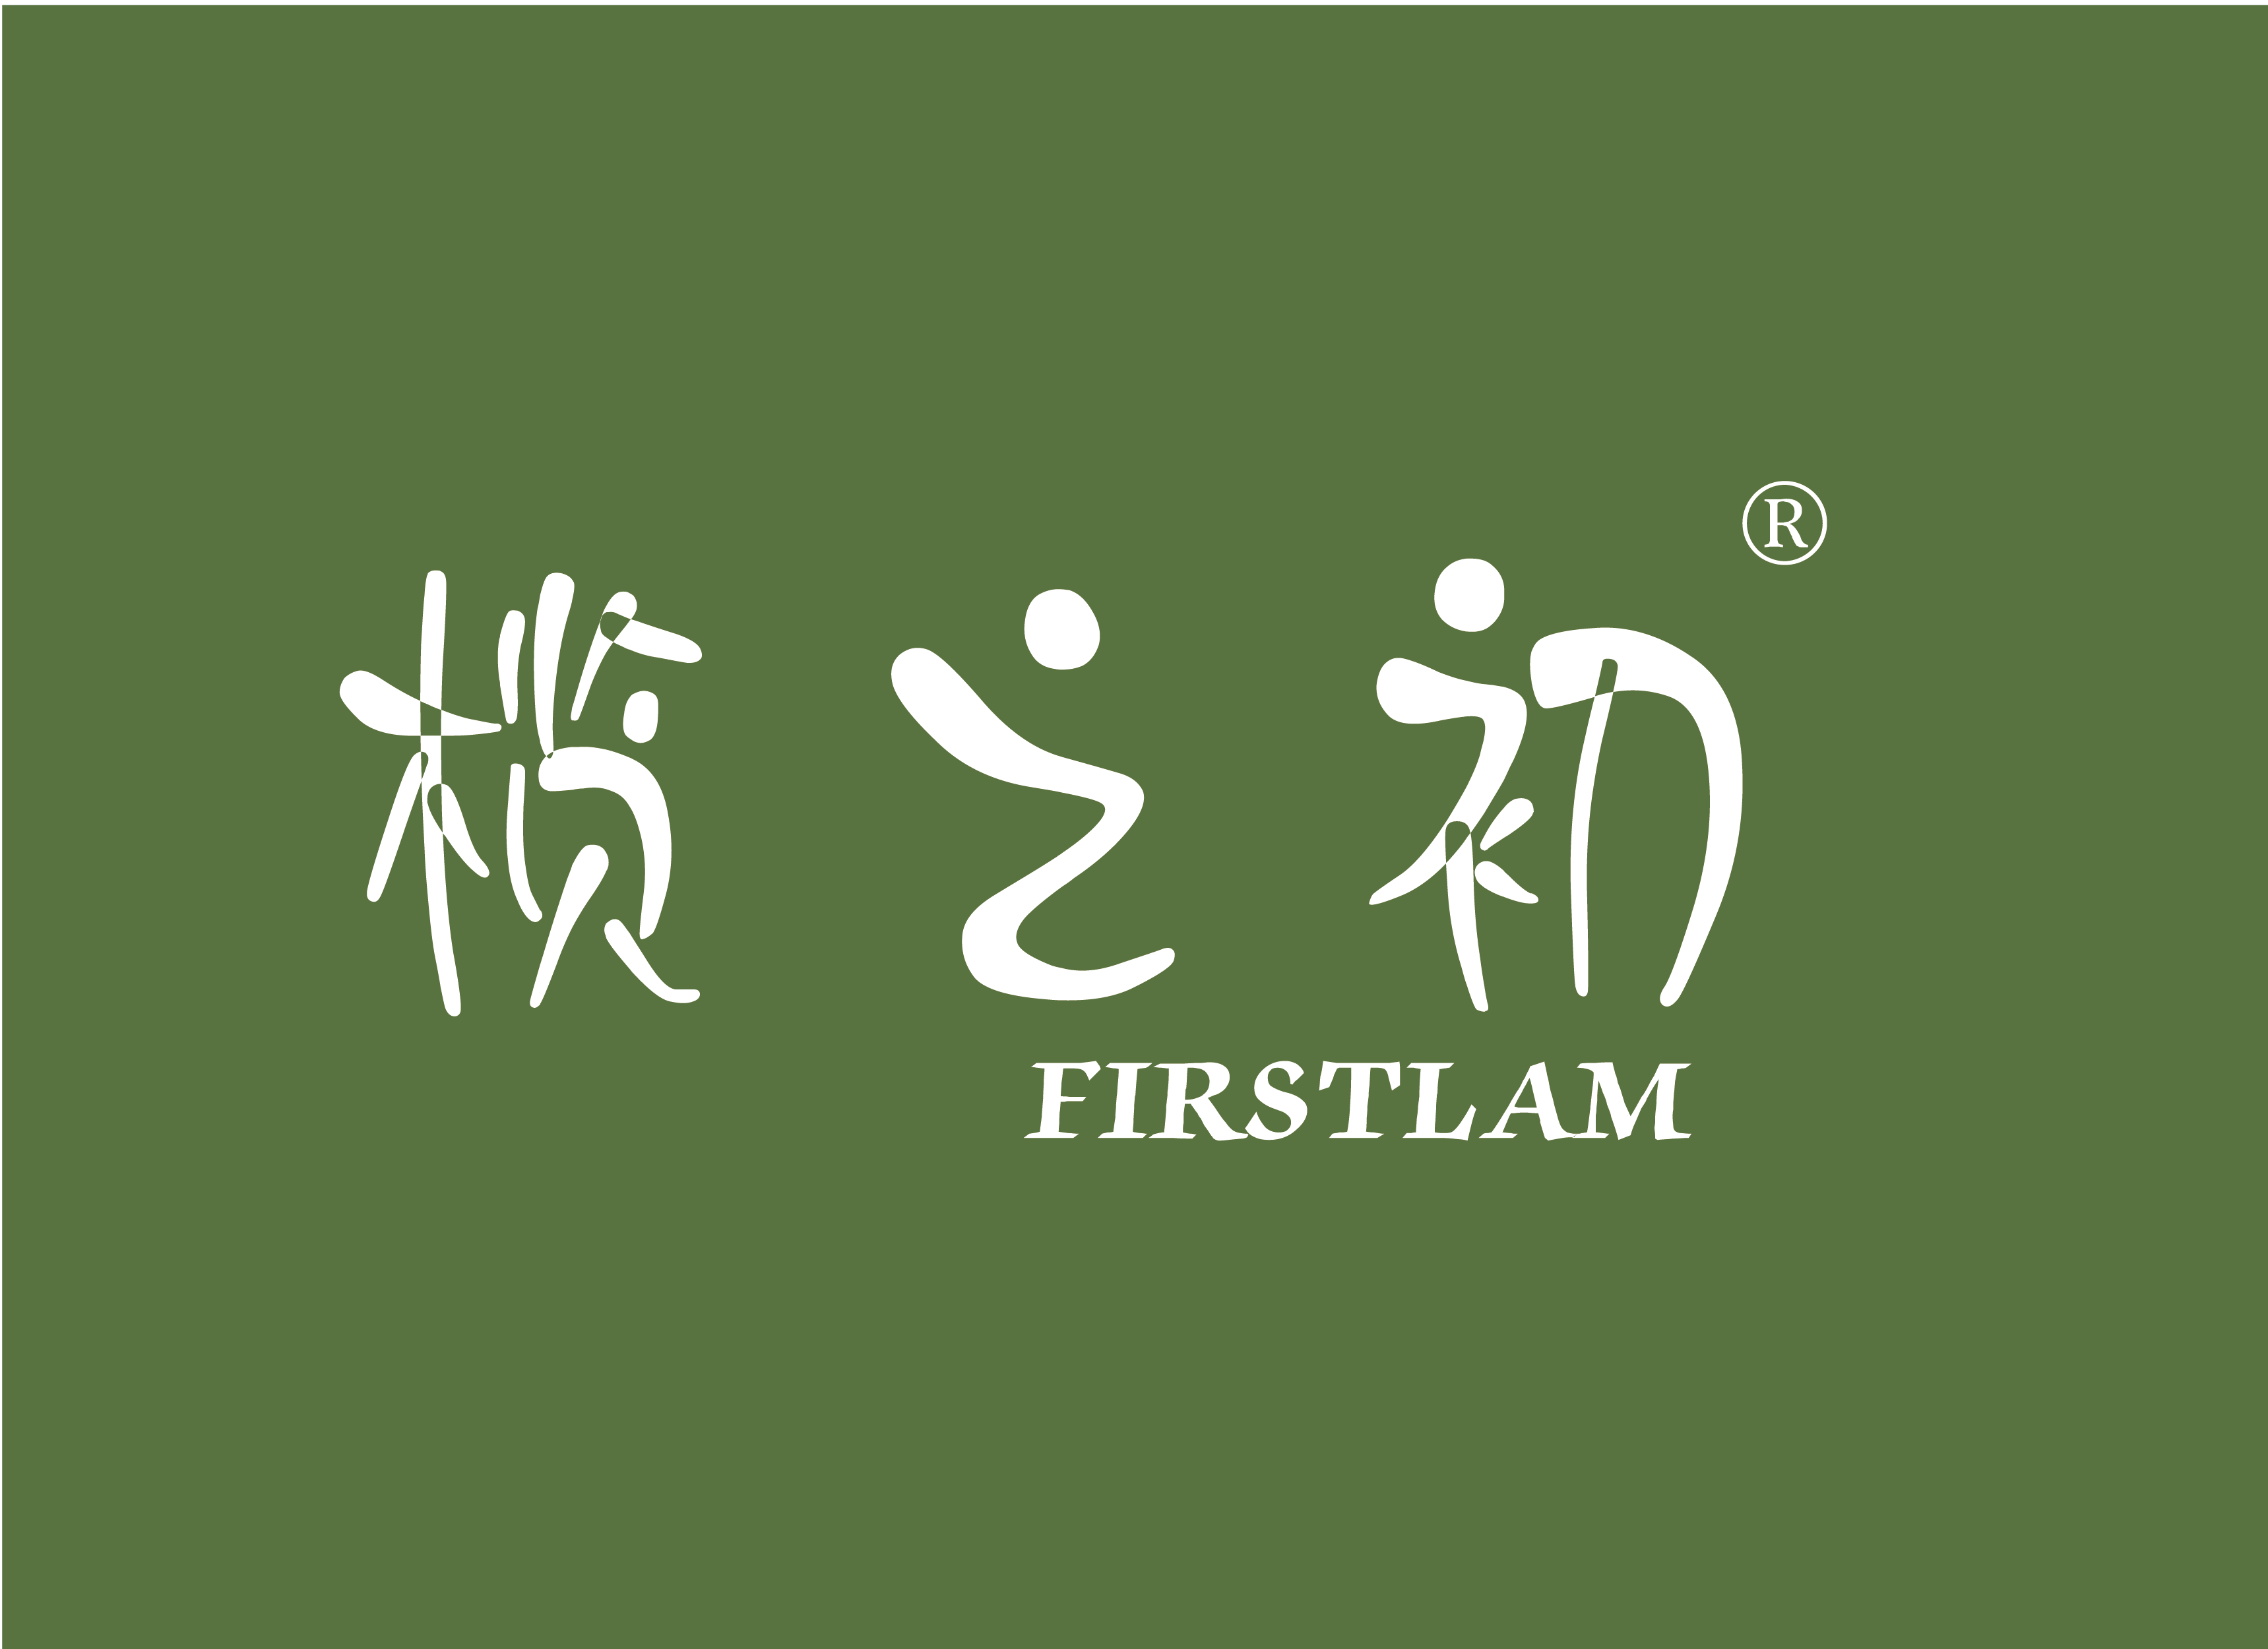 榄之初 FIRSTLAM